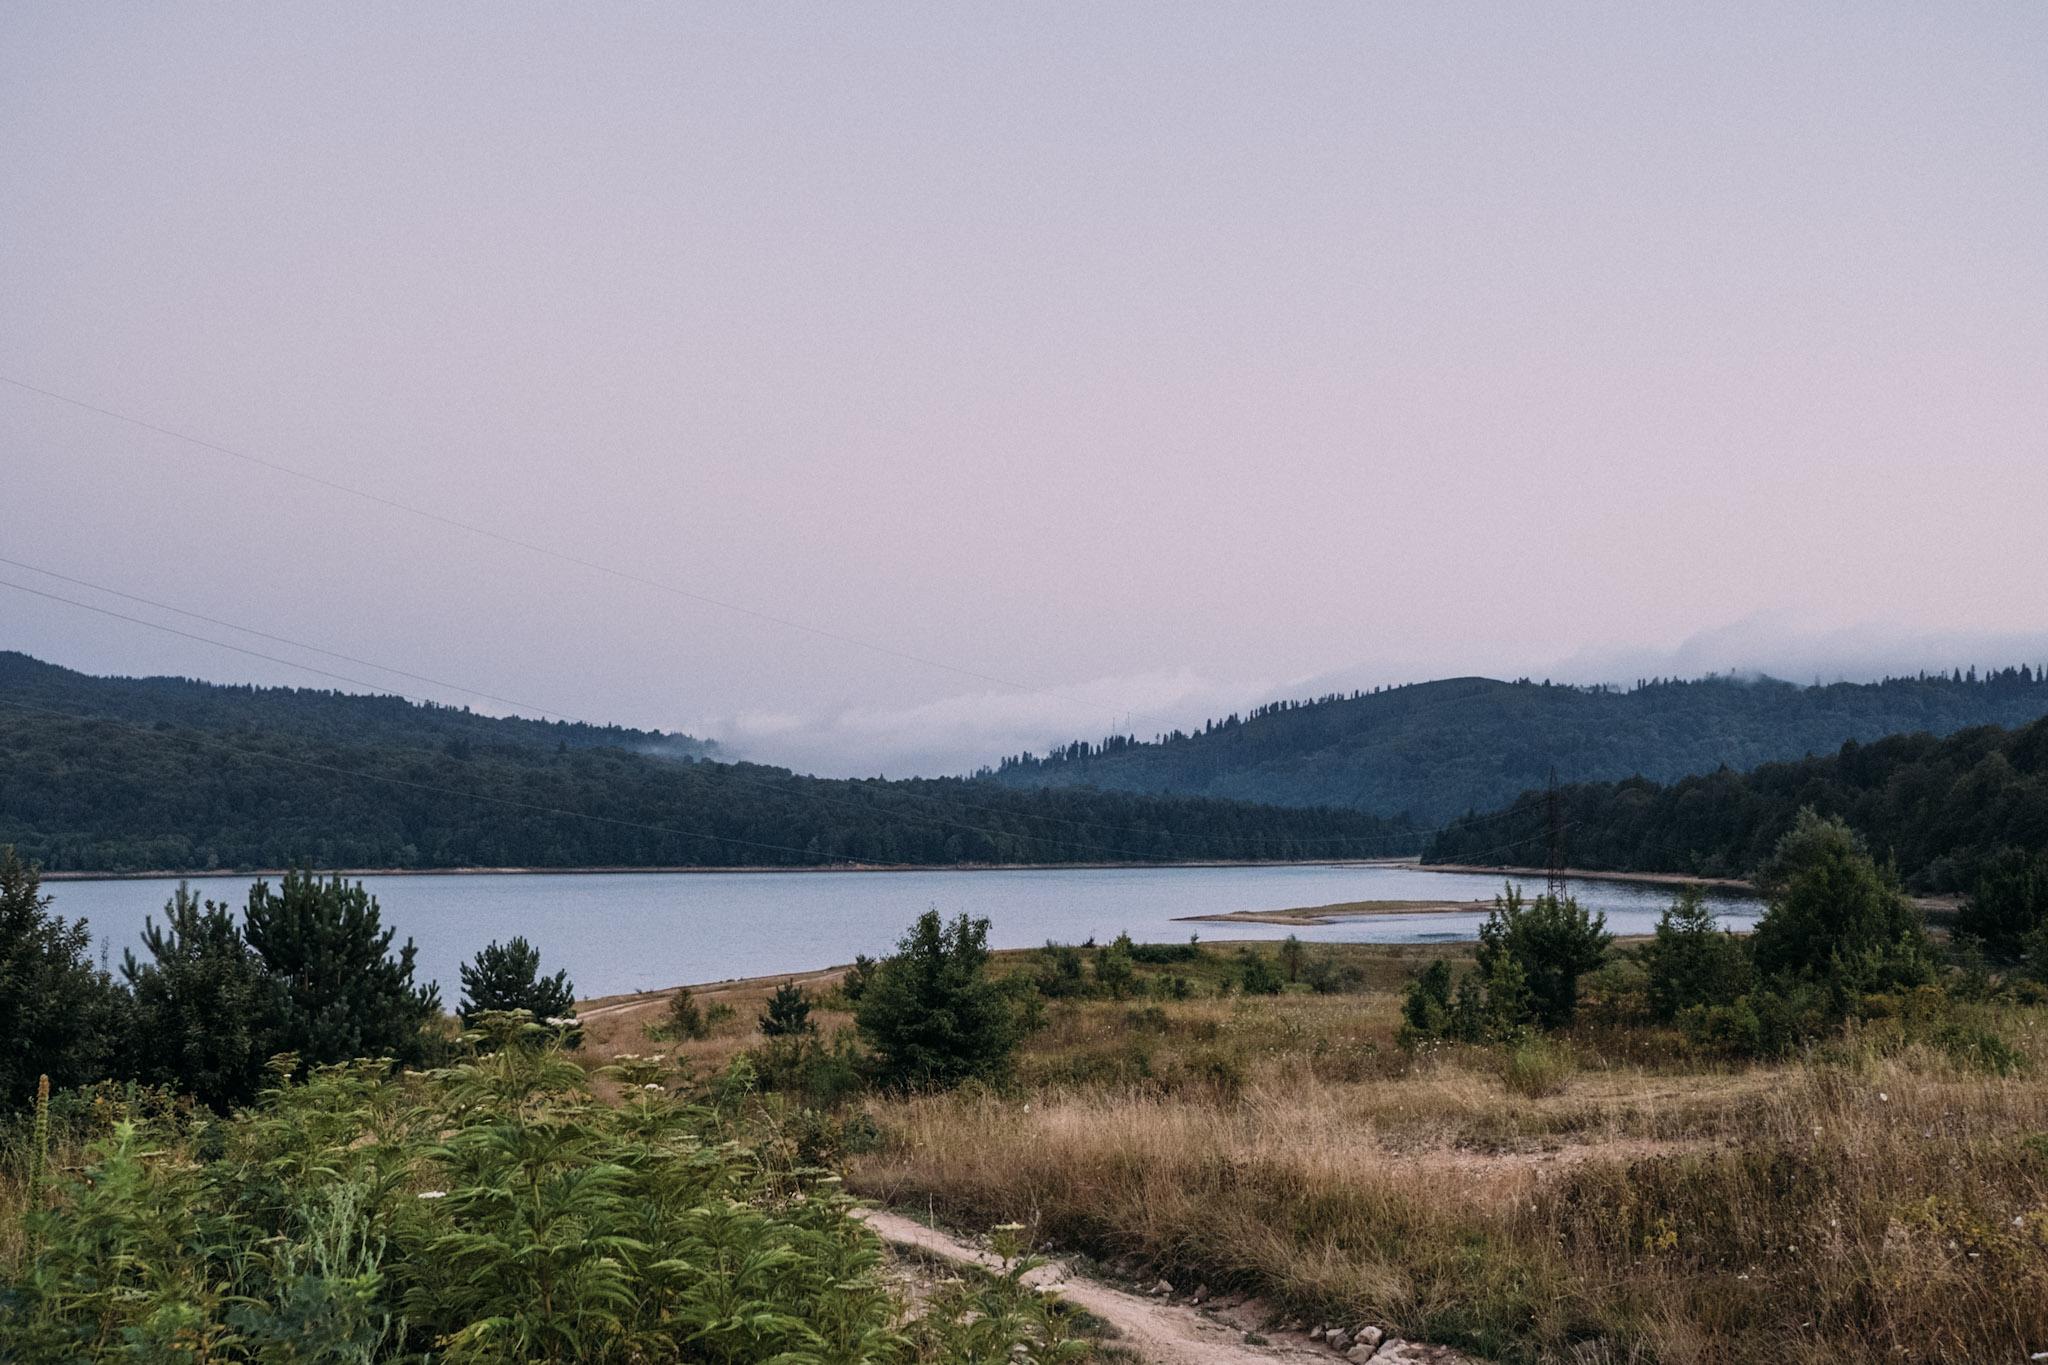 Shaori Lake in Georgia is shown under a cloudy sky in this photograph by Dimitri Mais